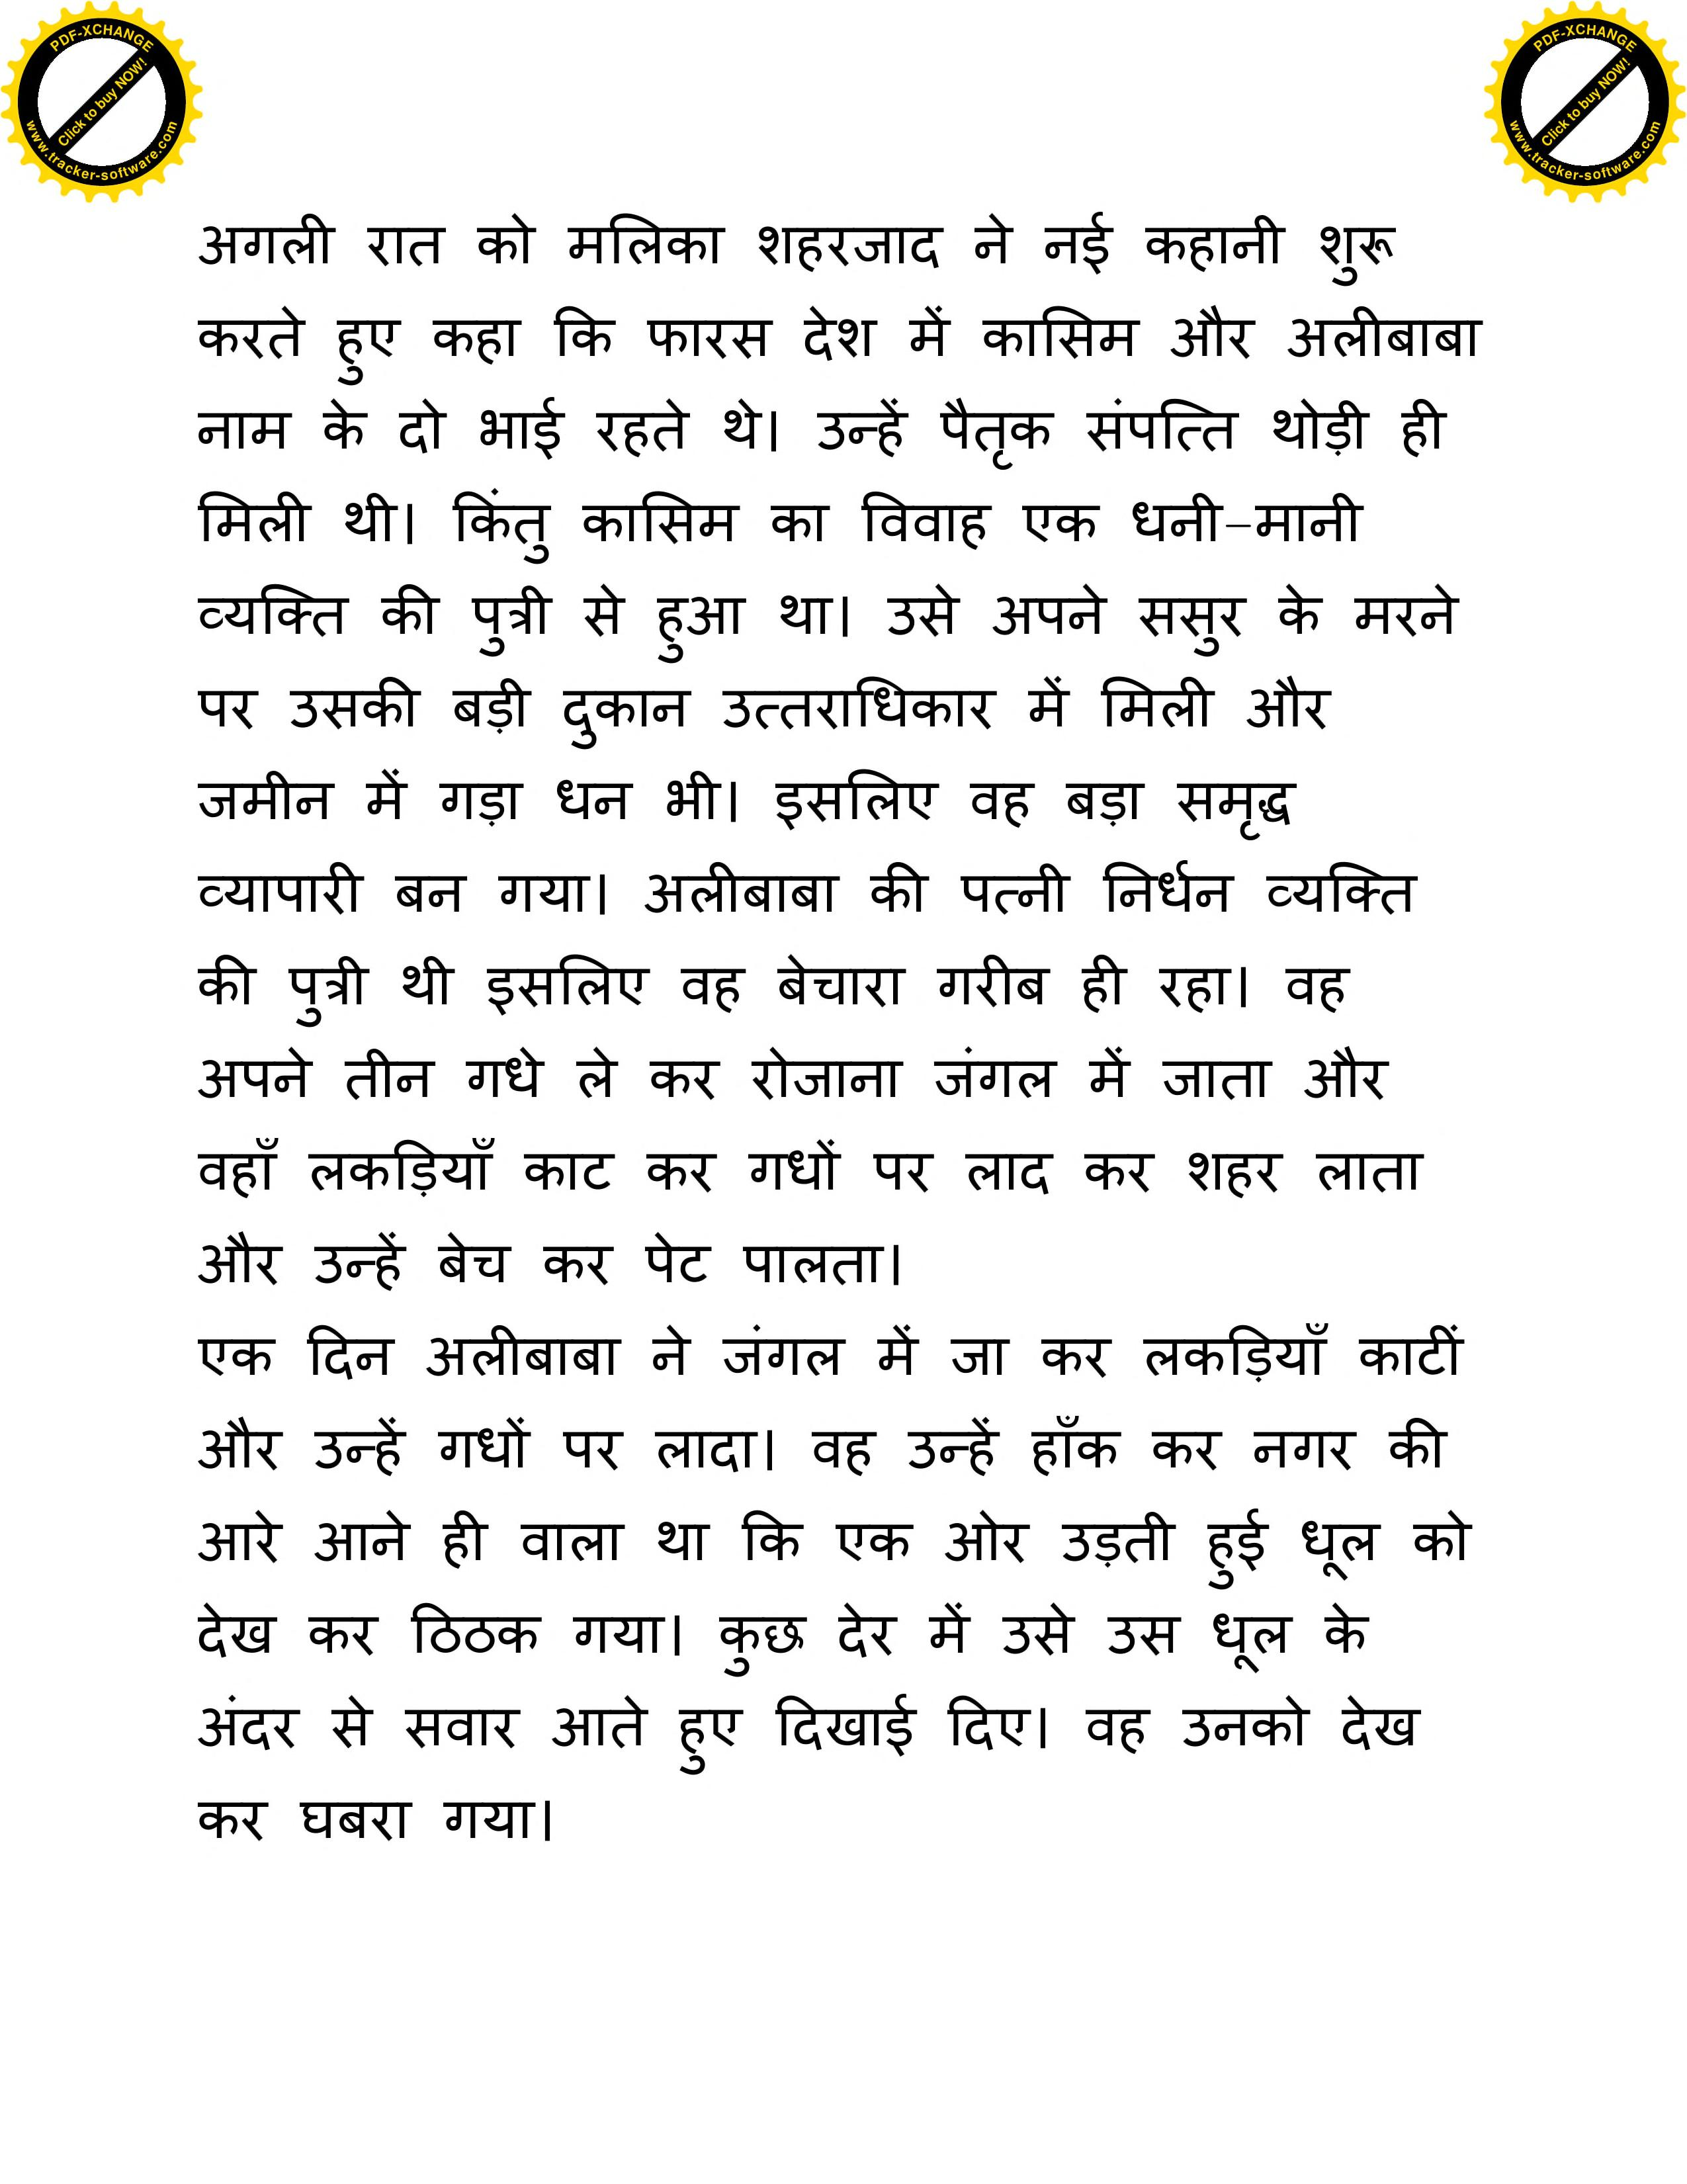 Ali Baba 40 Chor Forty Thieves Hindi Free Download Borrow And Streaming Internet Archive Alibaba aur chalis chor book. ali baba 40 chor forty thieves hindi